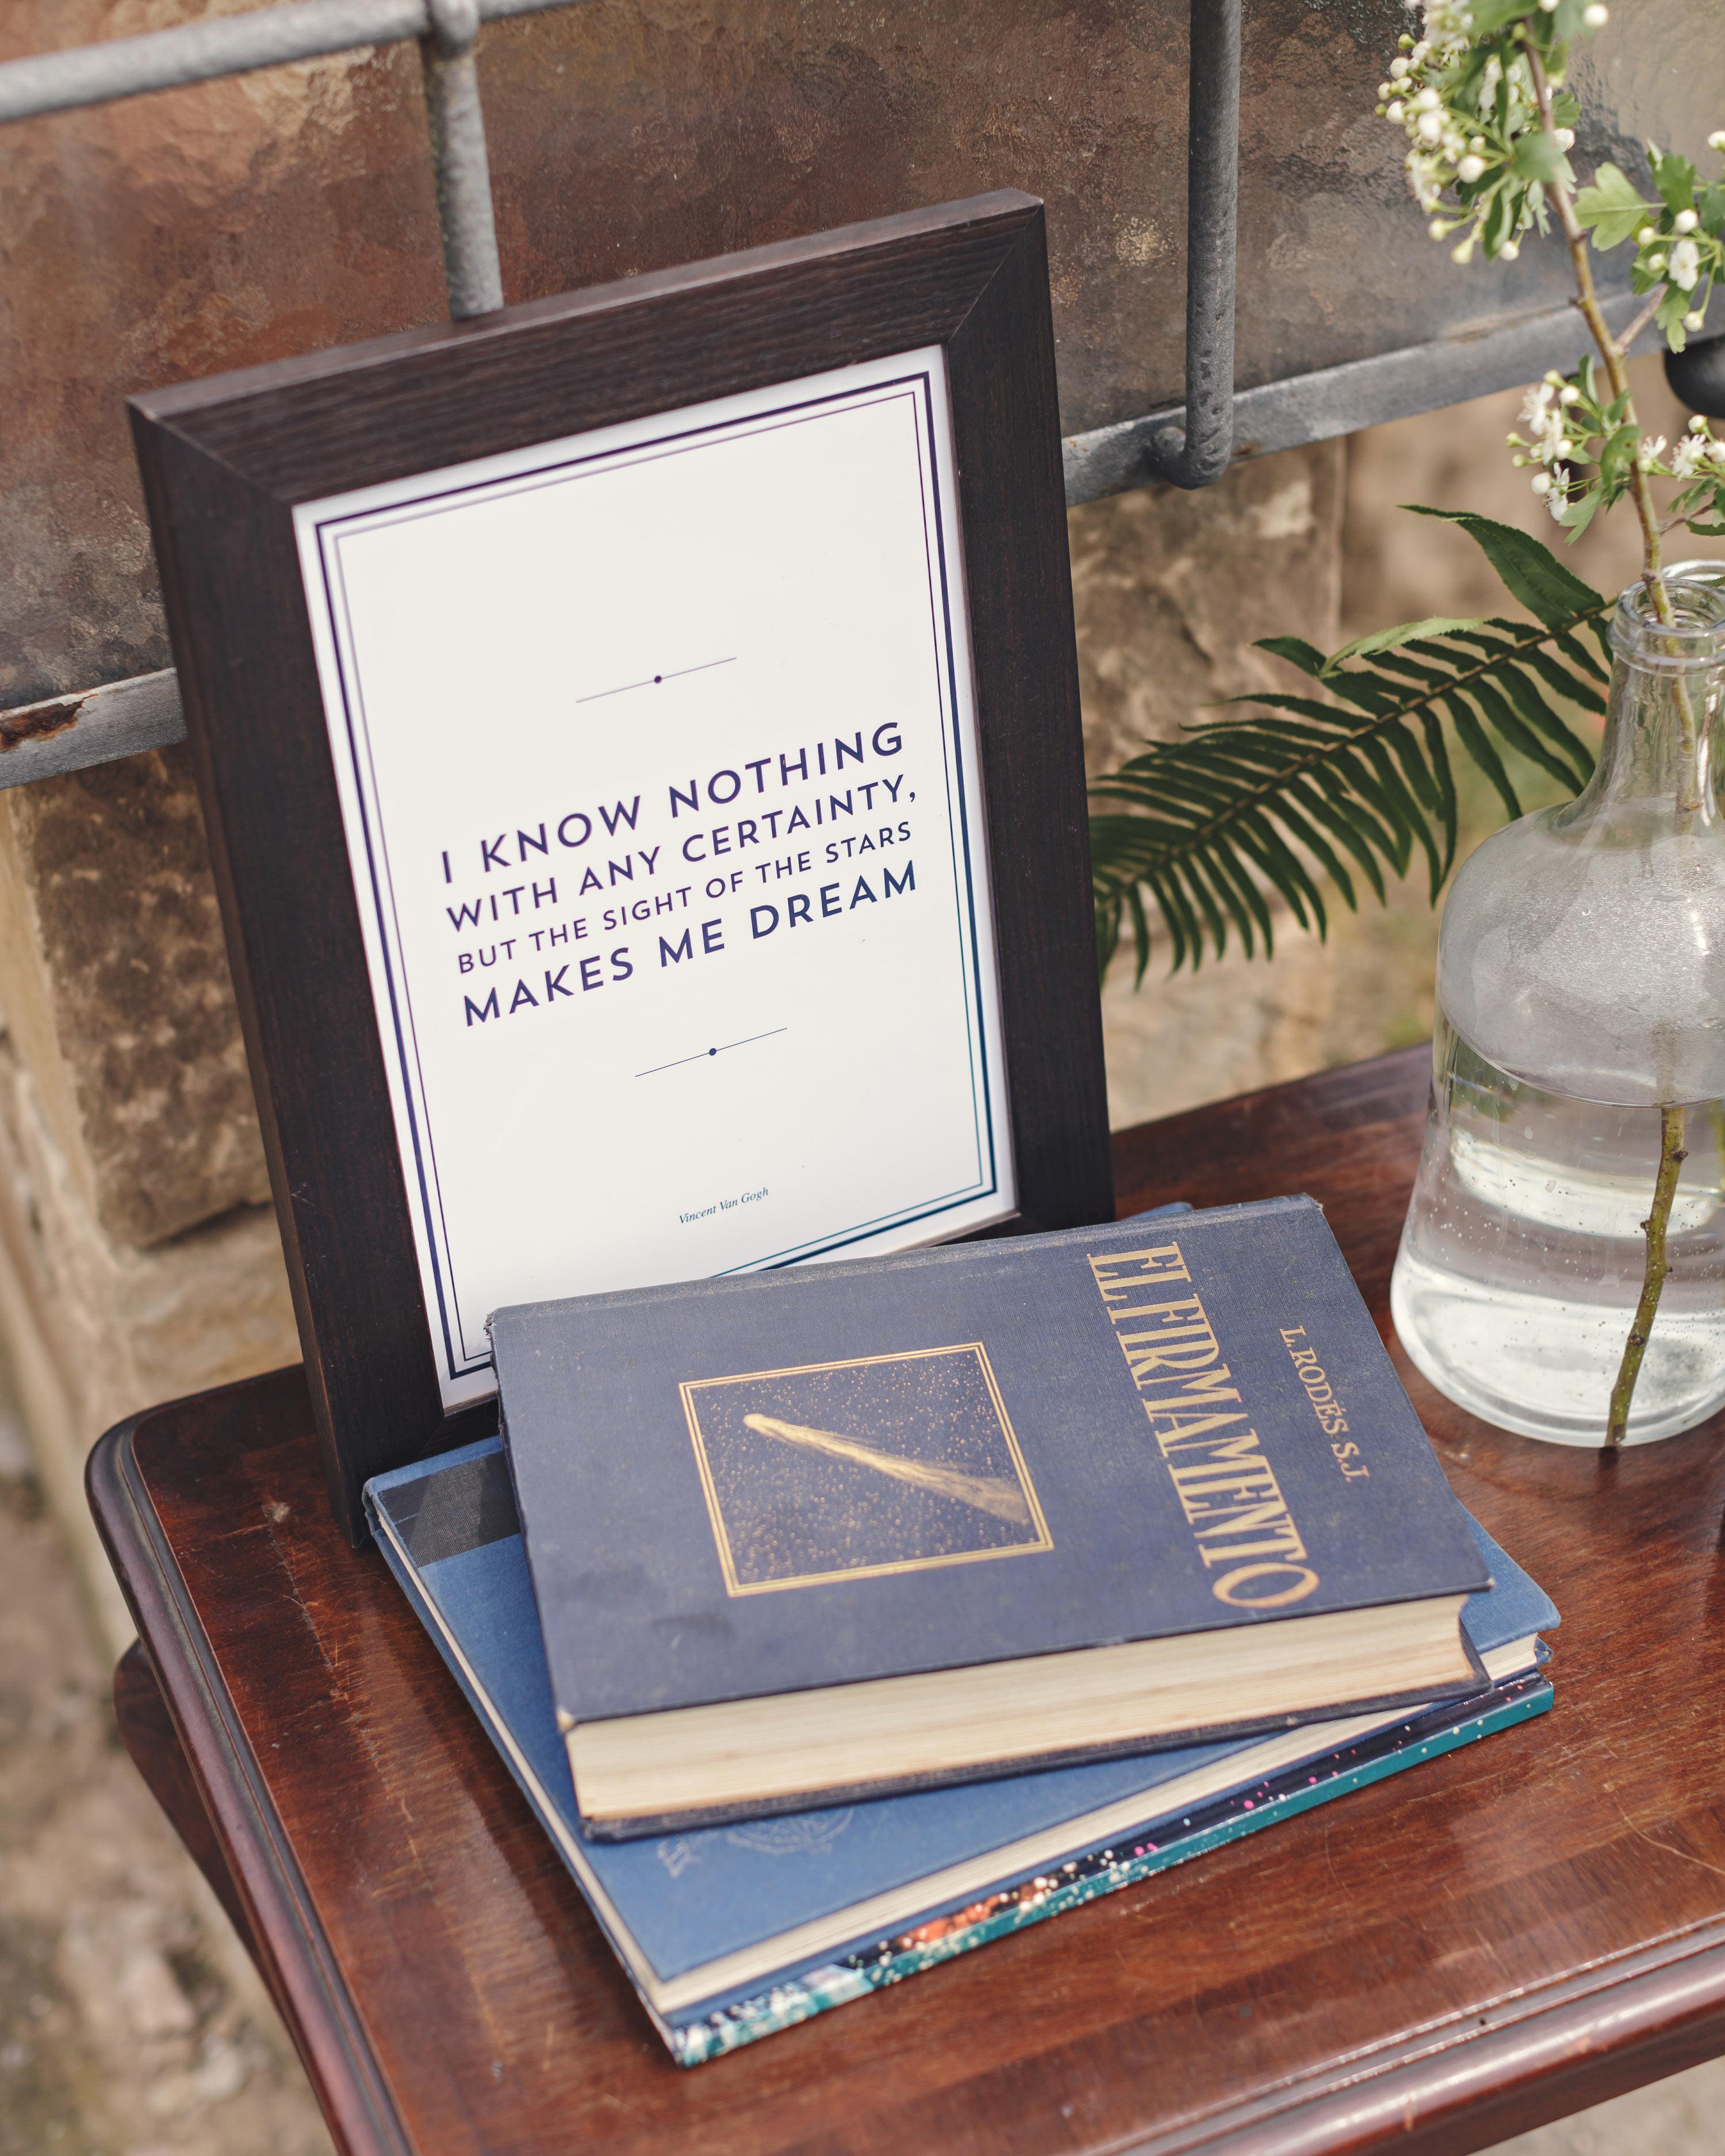 anna-ania-wedding-books-0504-s112510-0216.jpg